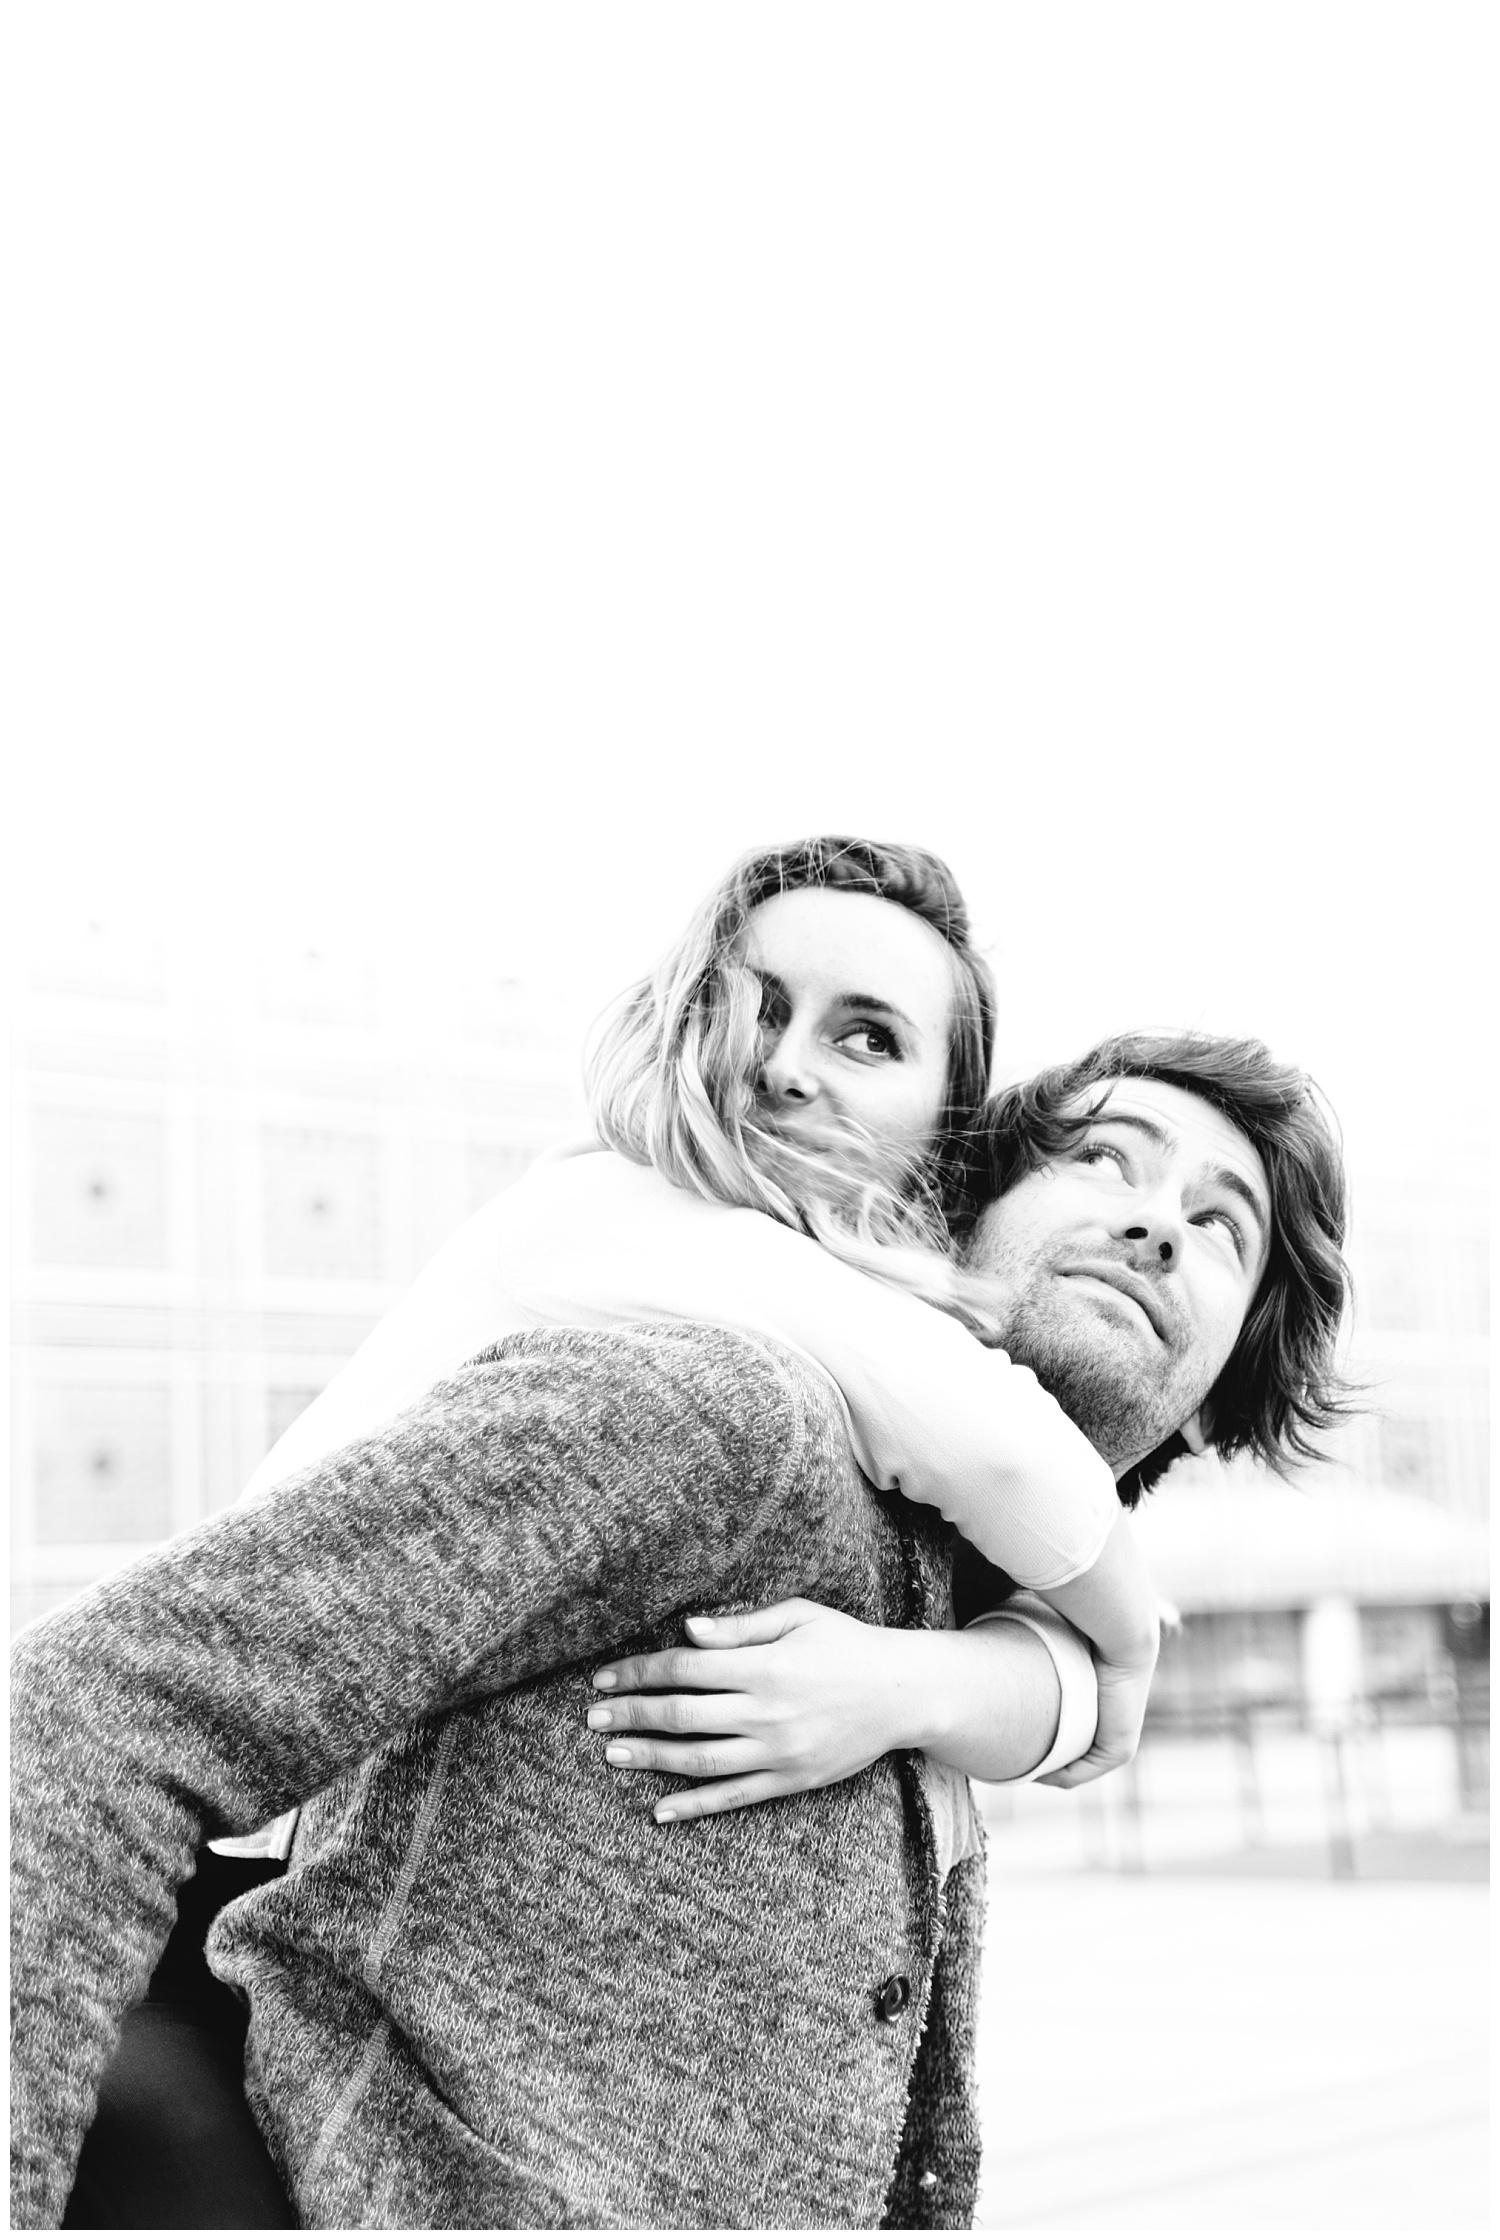 Tatiana_Liam_couple__session_Gaetan_Jargot_0008.jpg